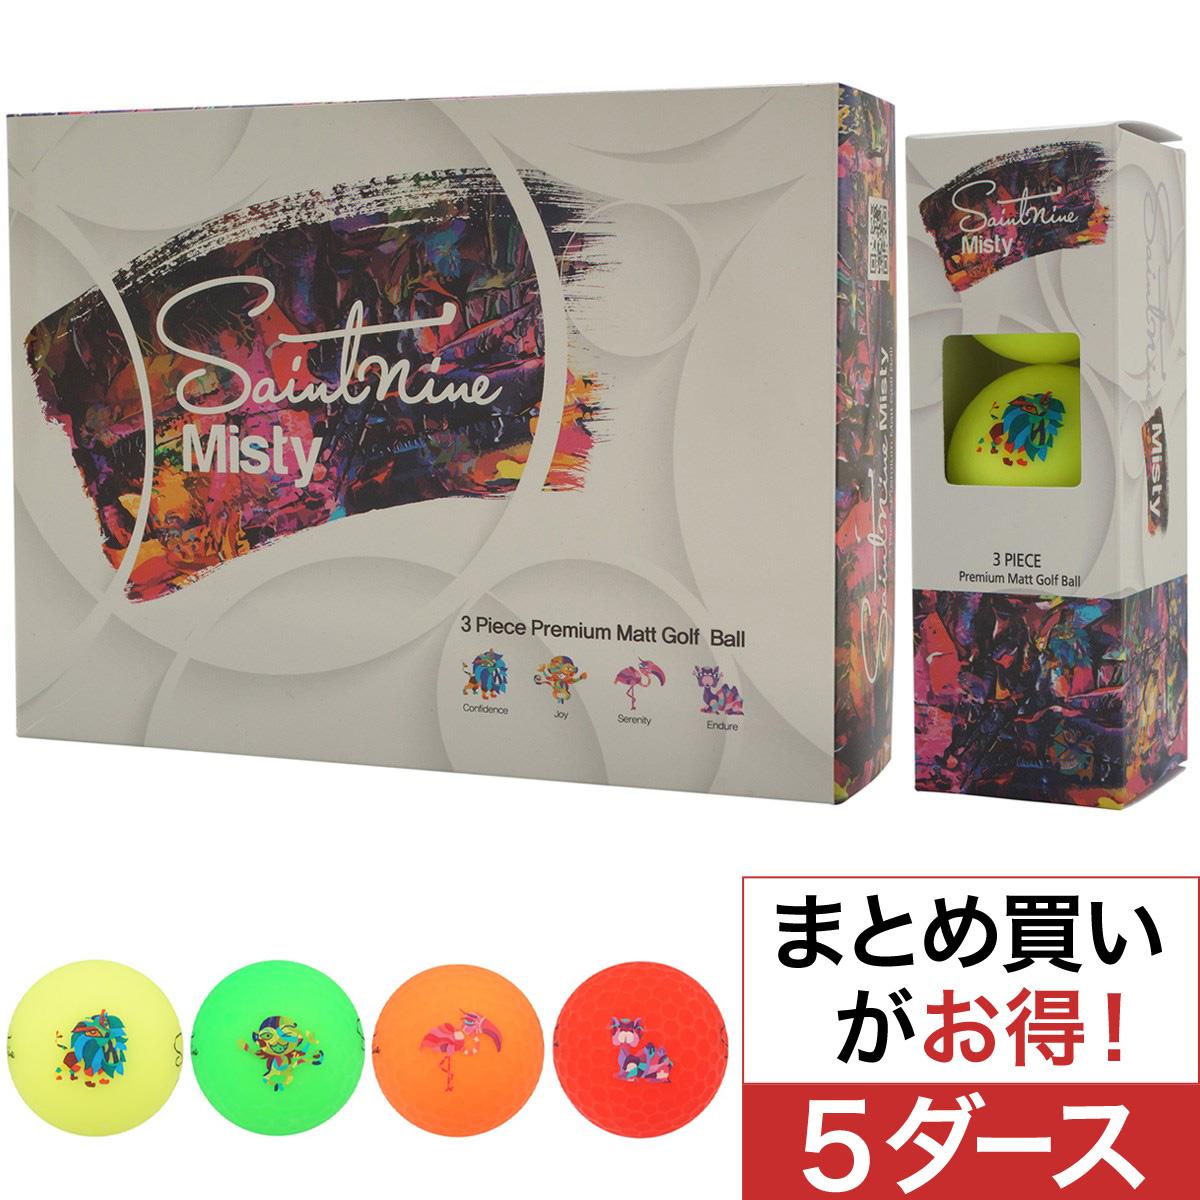 SAINTNINE Misty-Matte ボール 5ダースセット【非公認球】